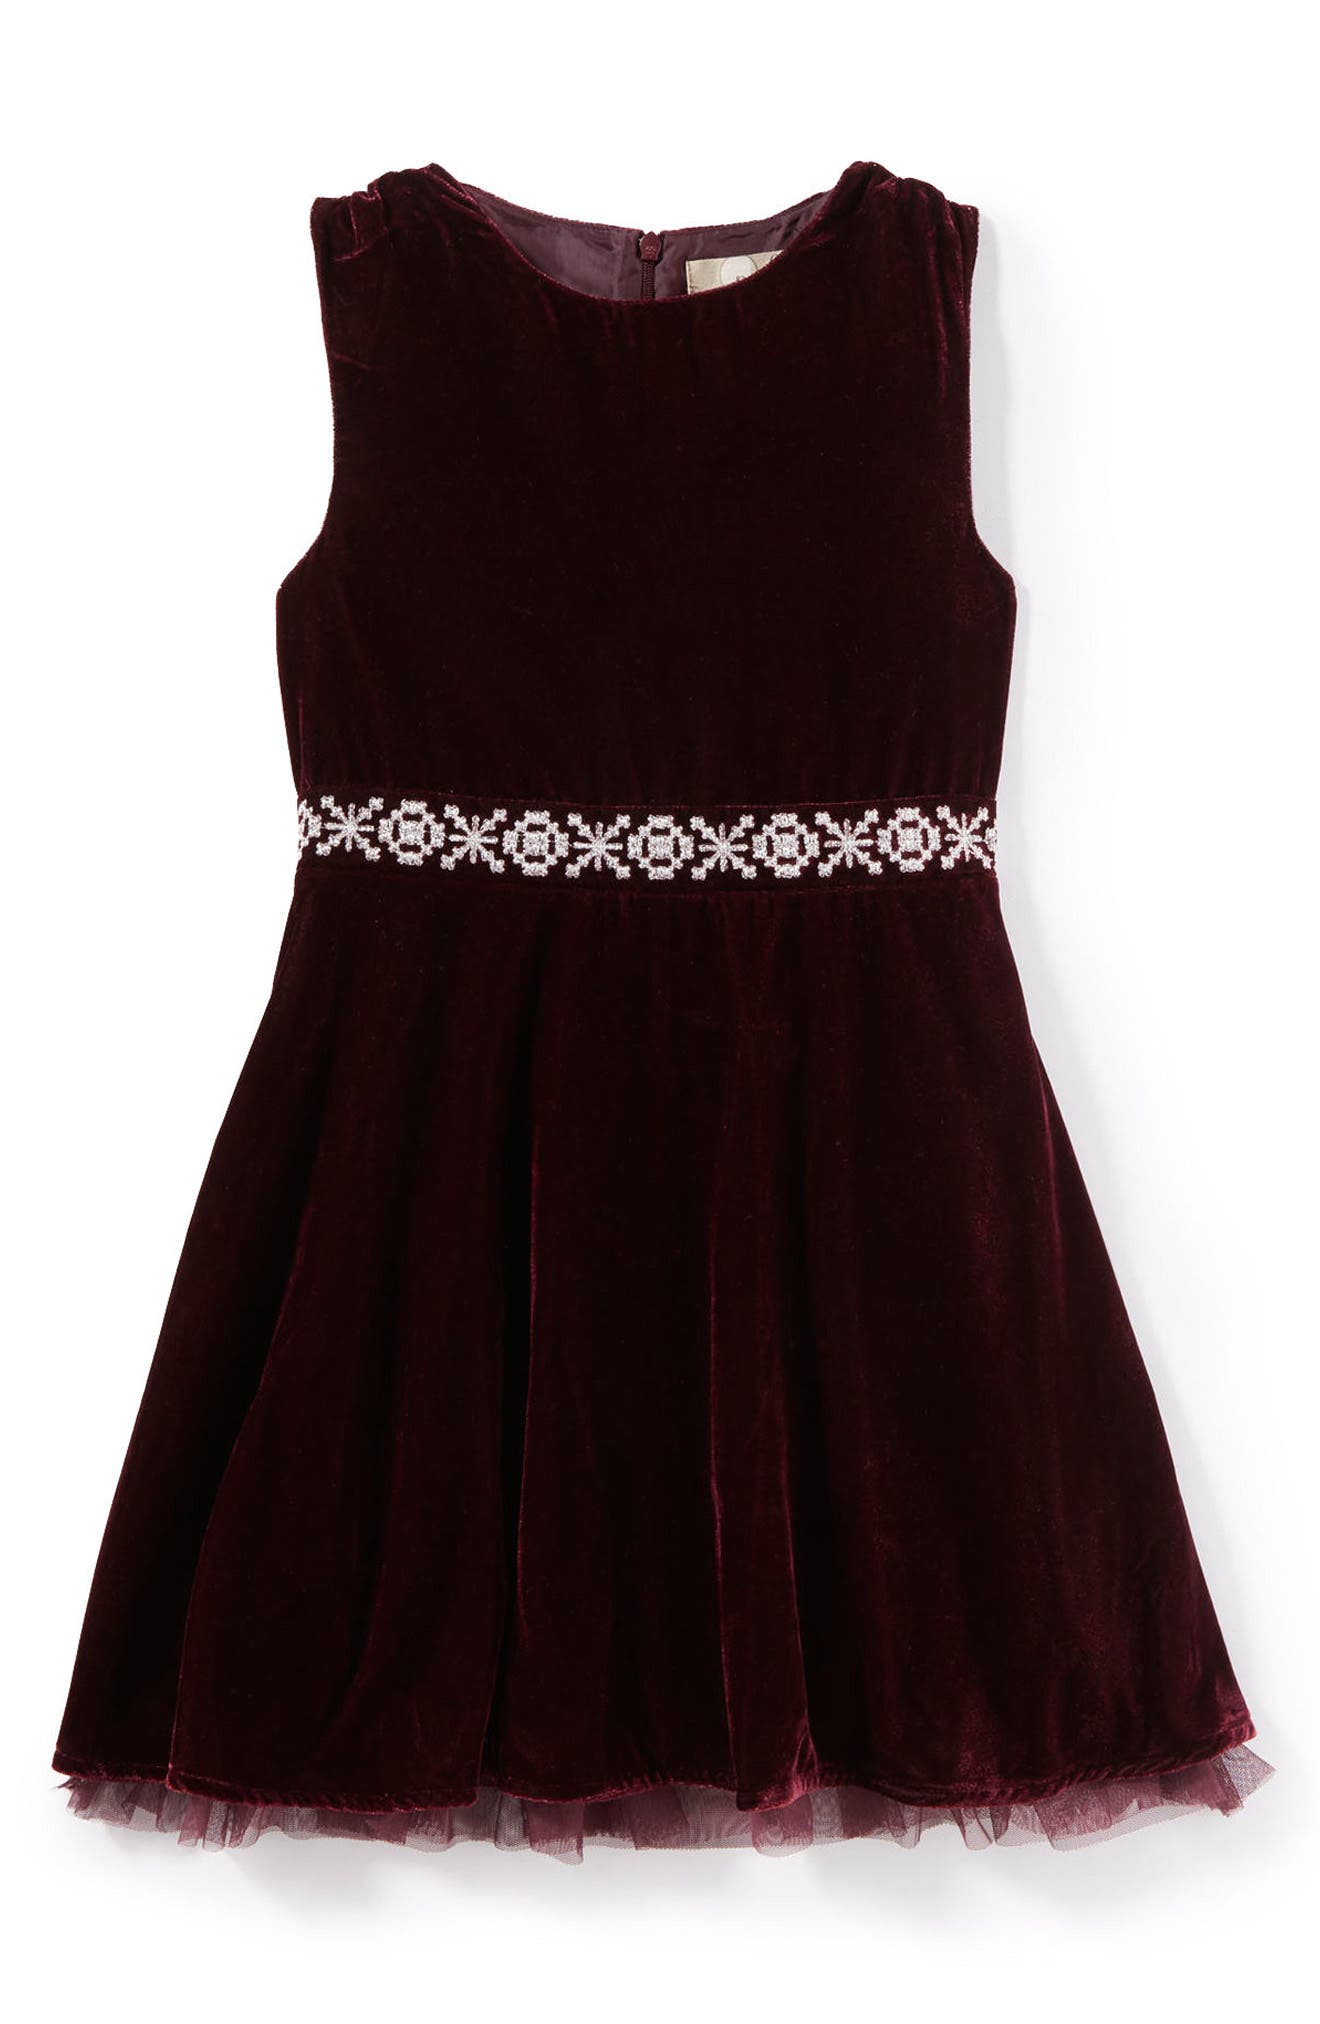 PEEK AREN'T YOU CURIOUS Peek Vera Embroidered Snowflake Velvet Dress, Main, color, 932